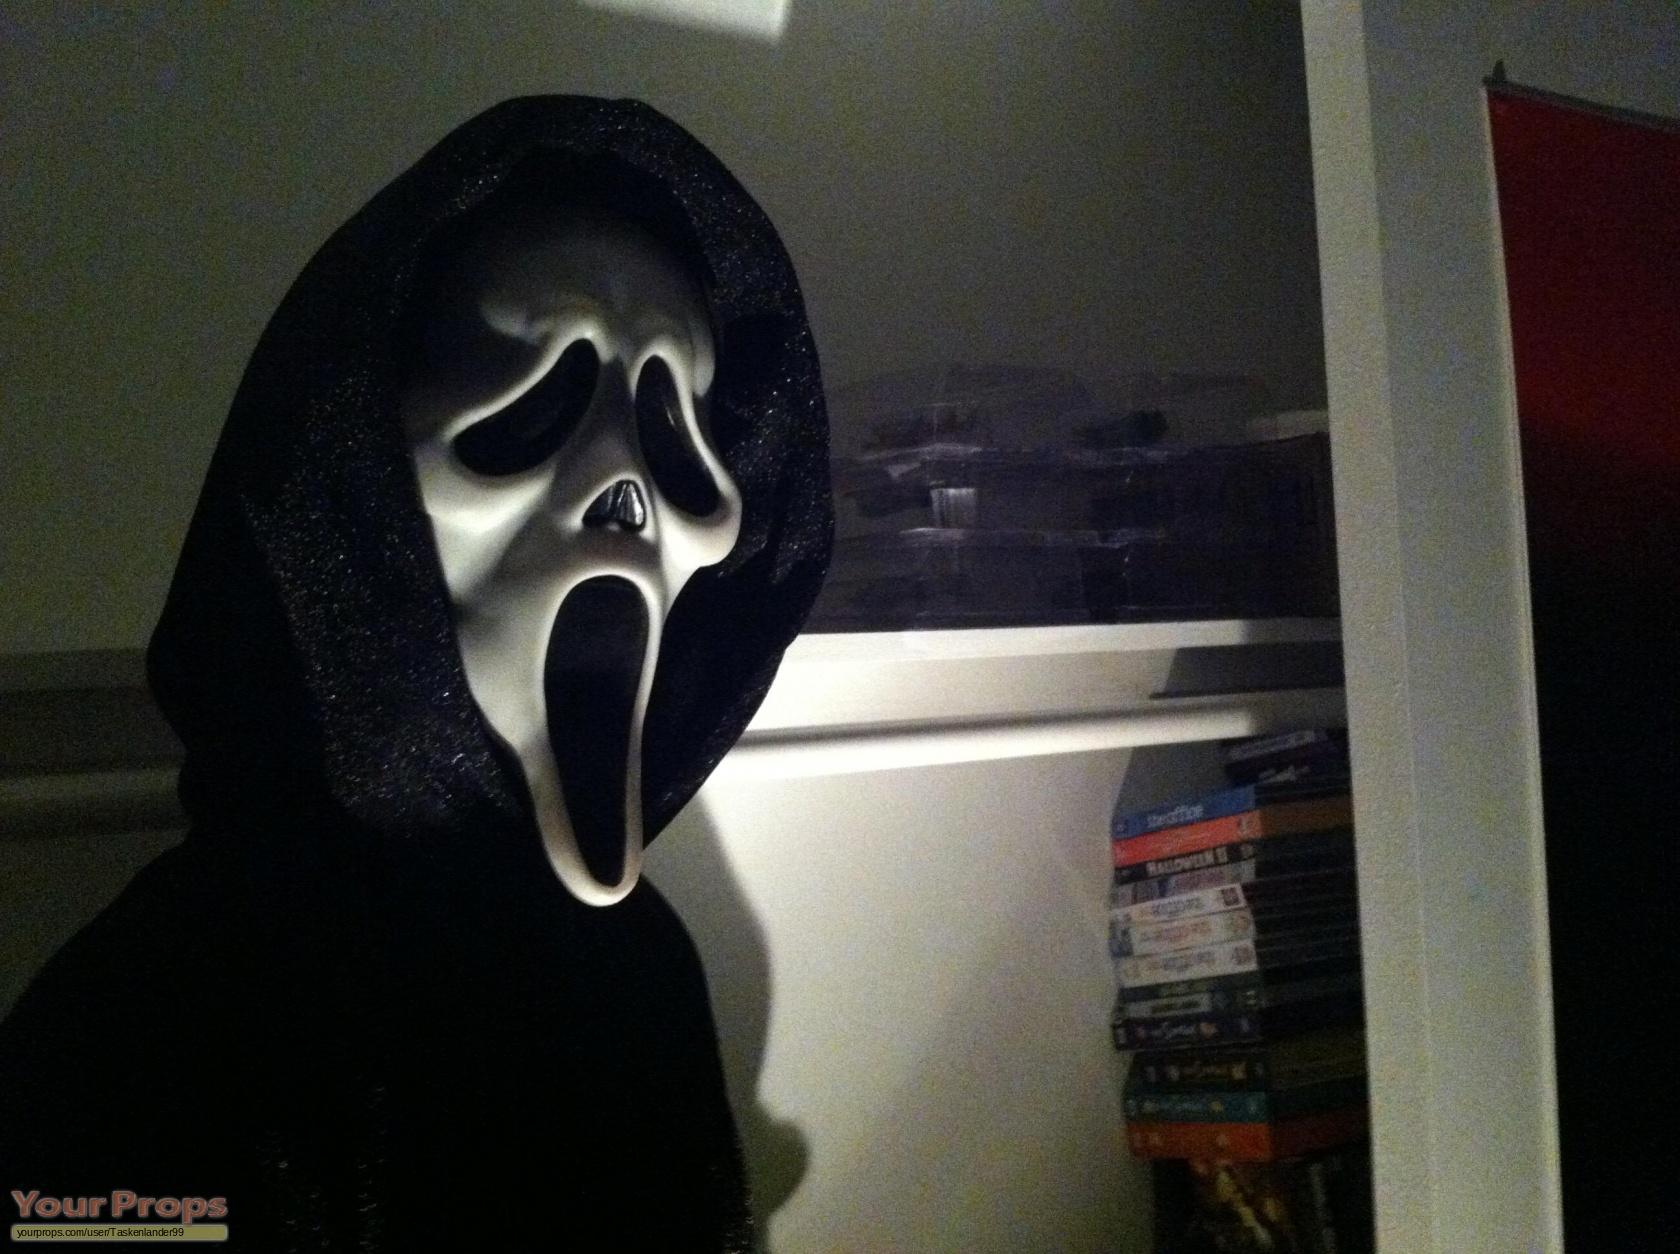 Scream 3 Ghostface Killer Lifesize replica movie costume